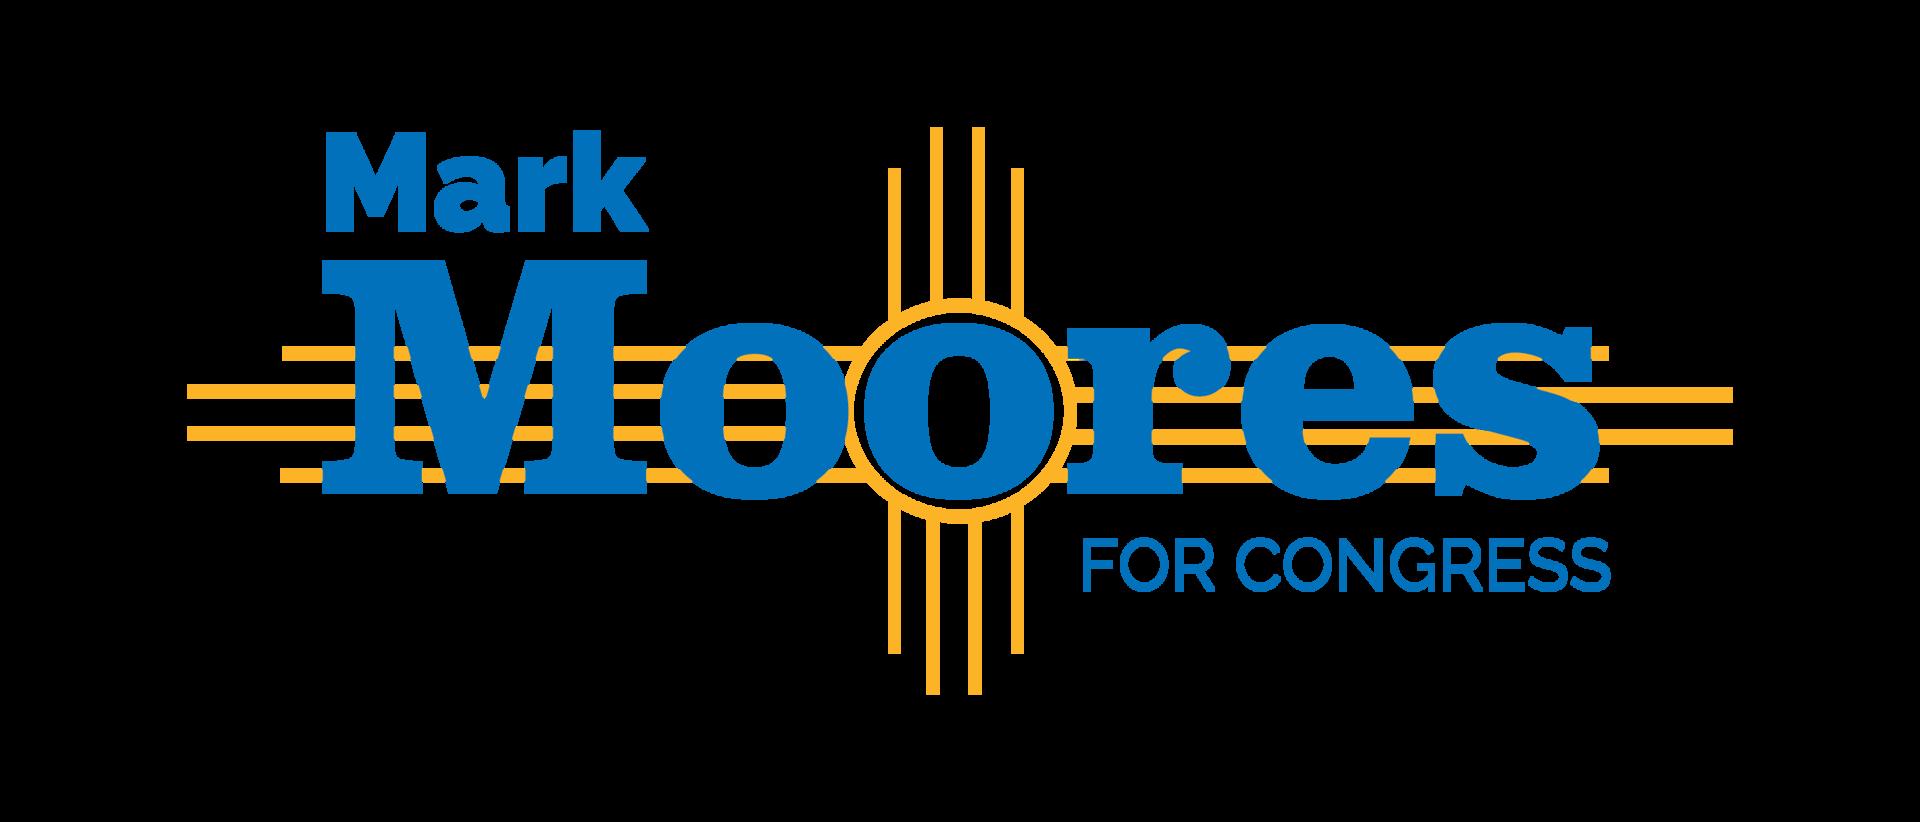 Moores logo congress rgb